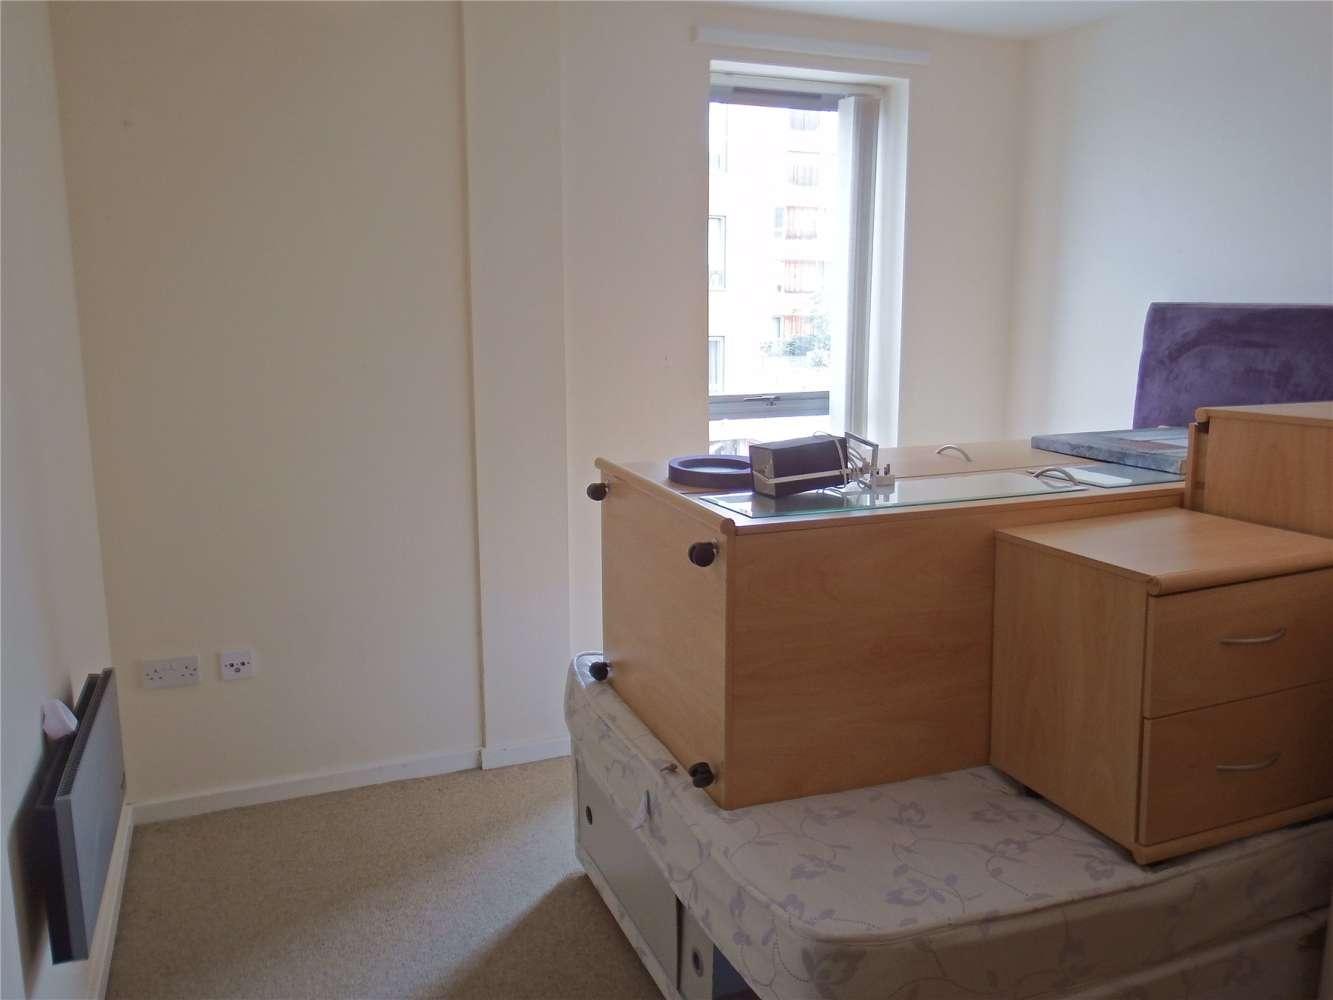 Apartment Leeds, LS2 - Ahlux Court Millwright Street Leeds West Yorkshire - 08